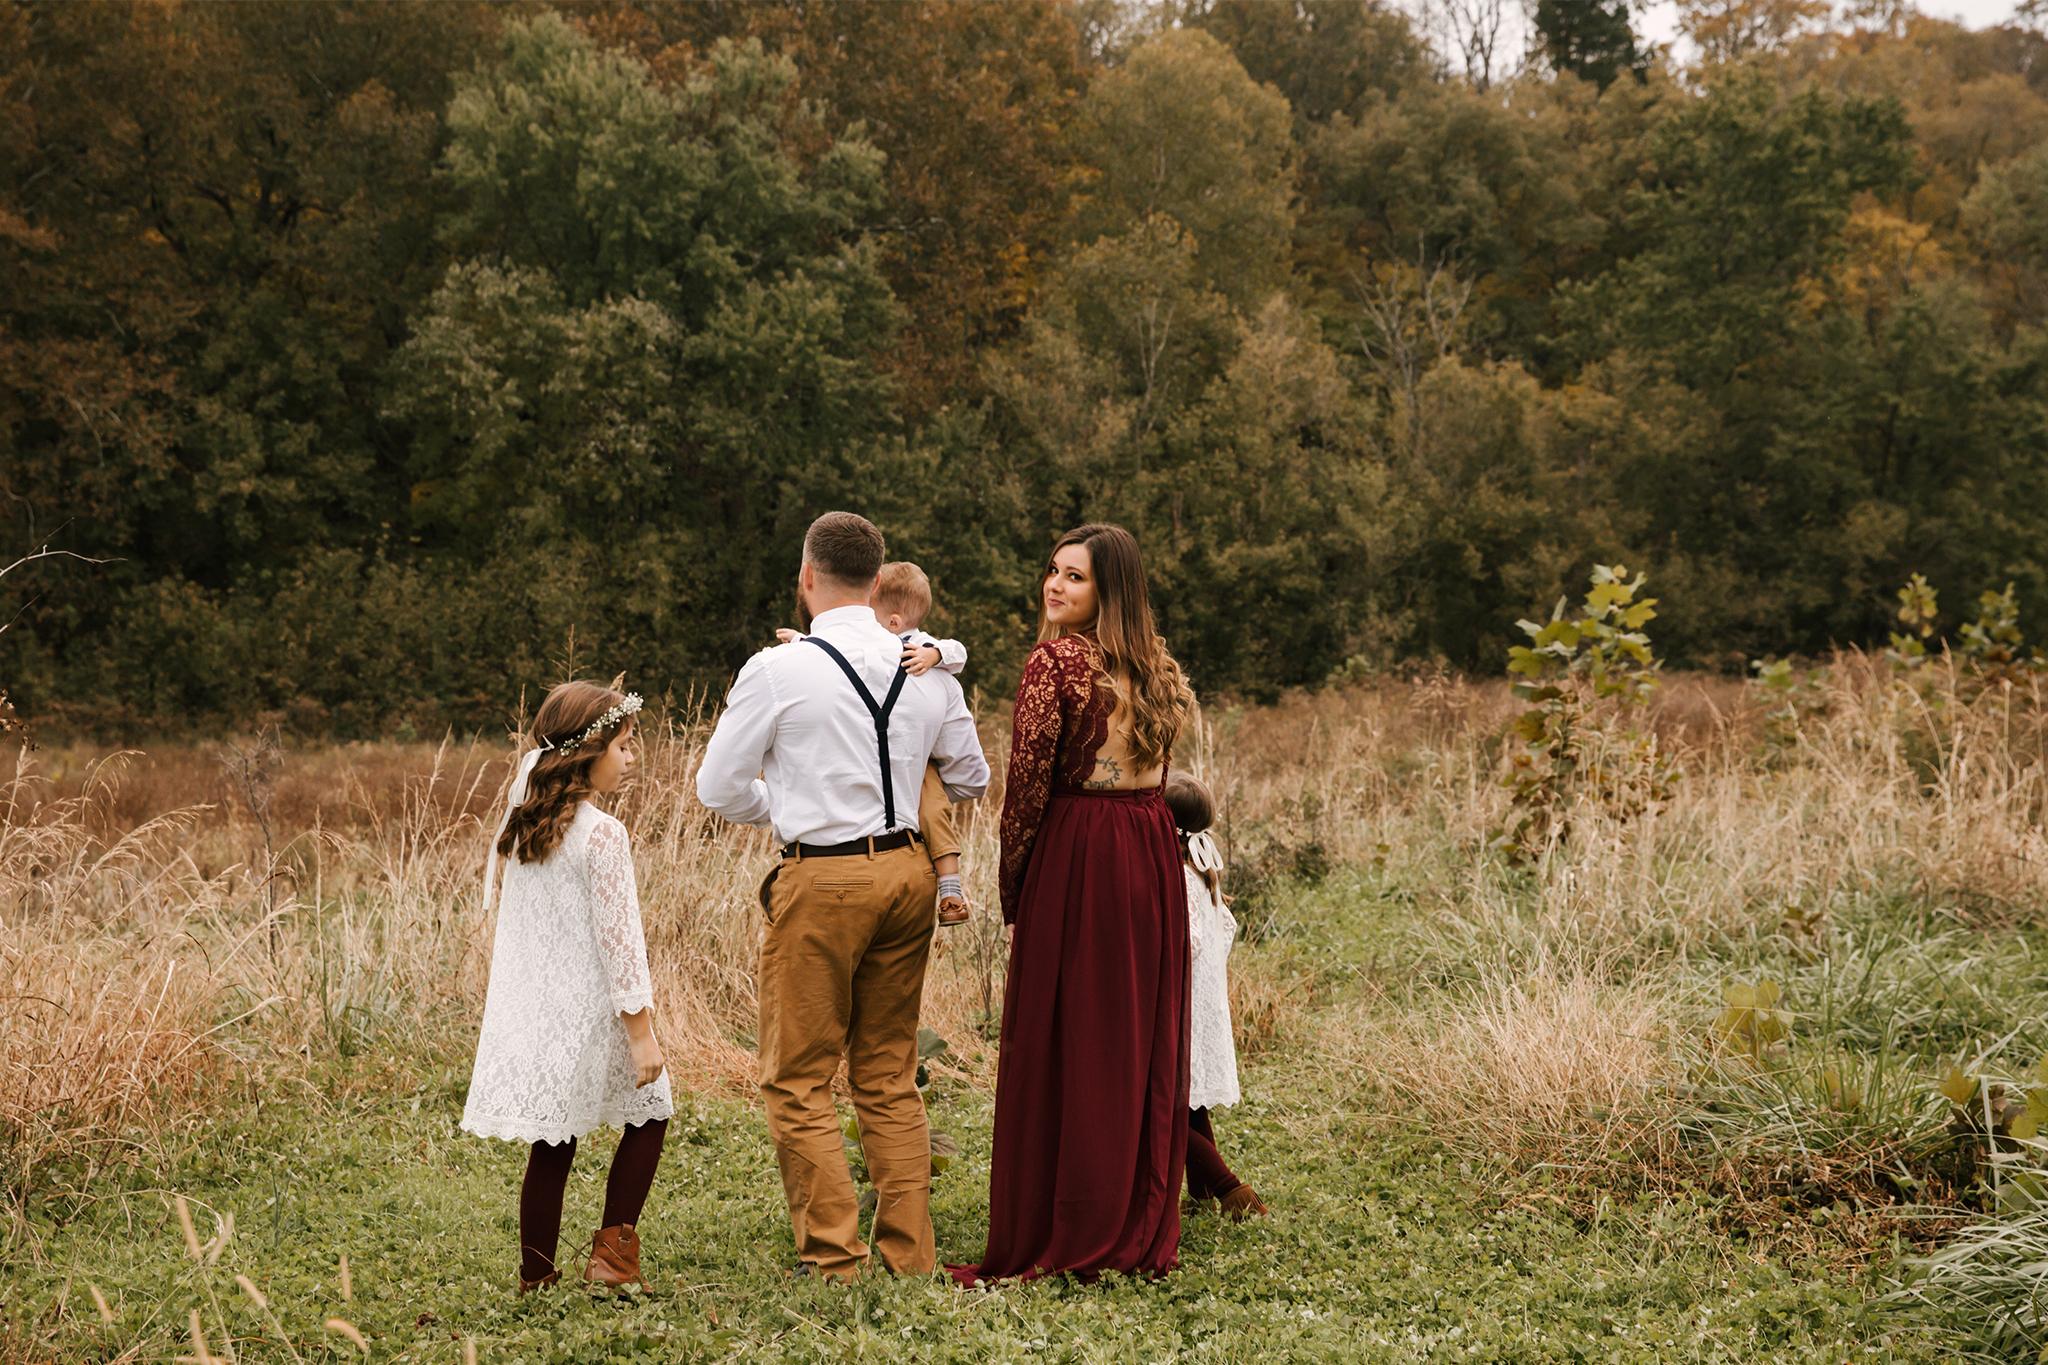 Red-Photographic-Wedding-Kentucky-Cisar-24.JPG